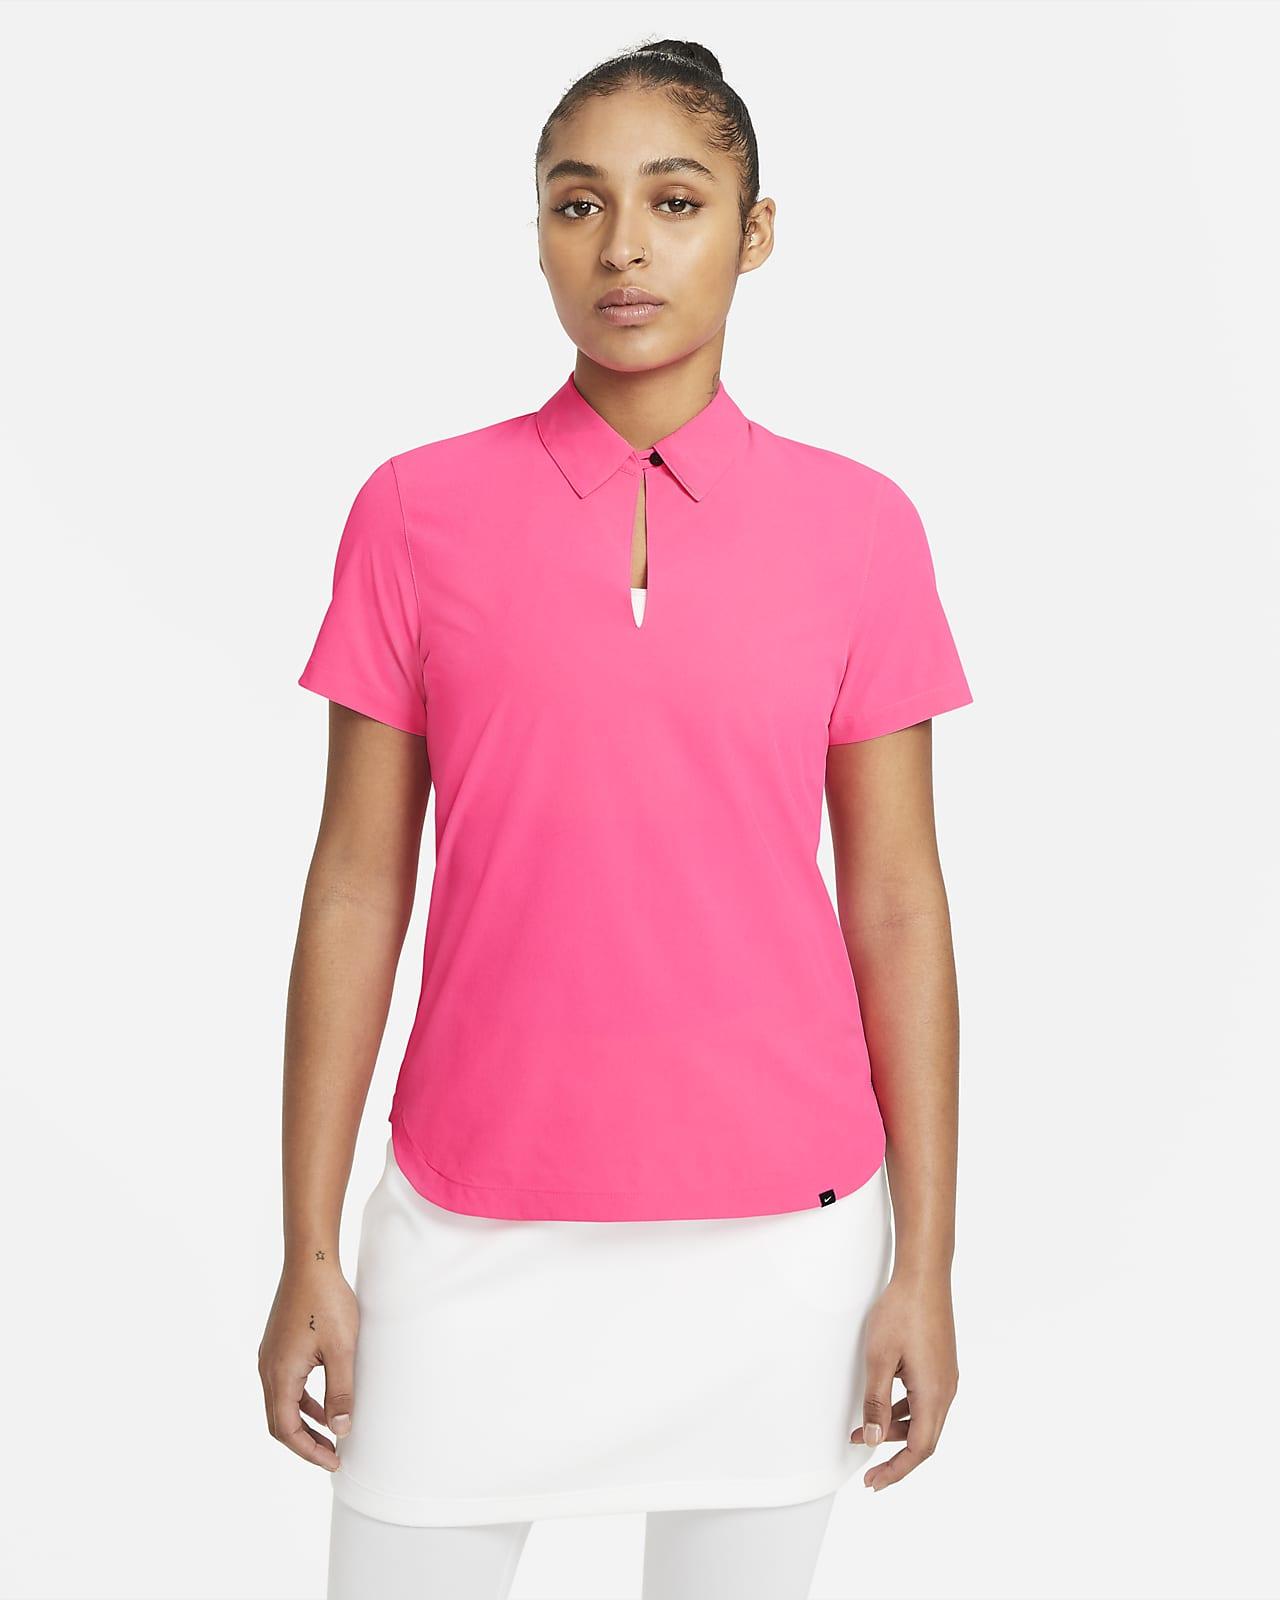 Golfpikétröja Nike Flex Ace för kvinnor